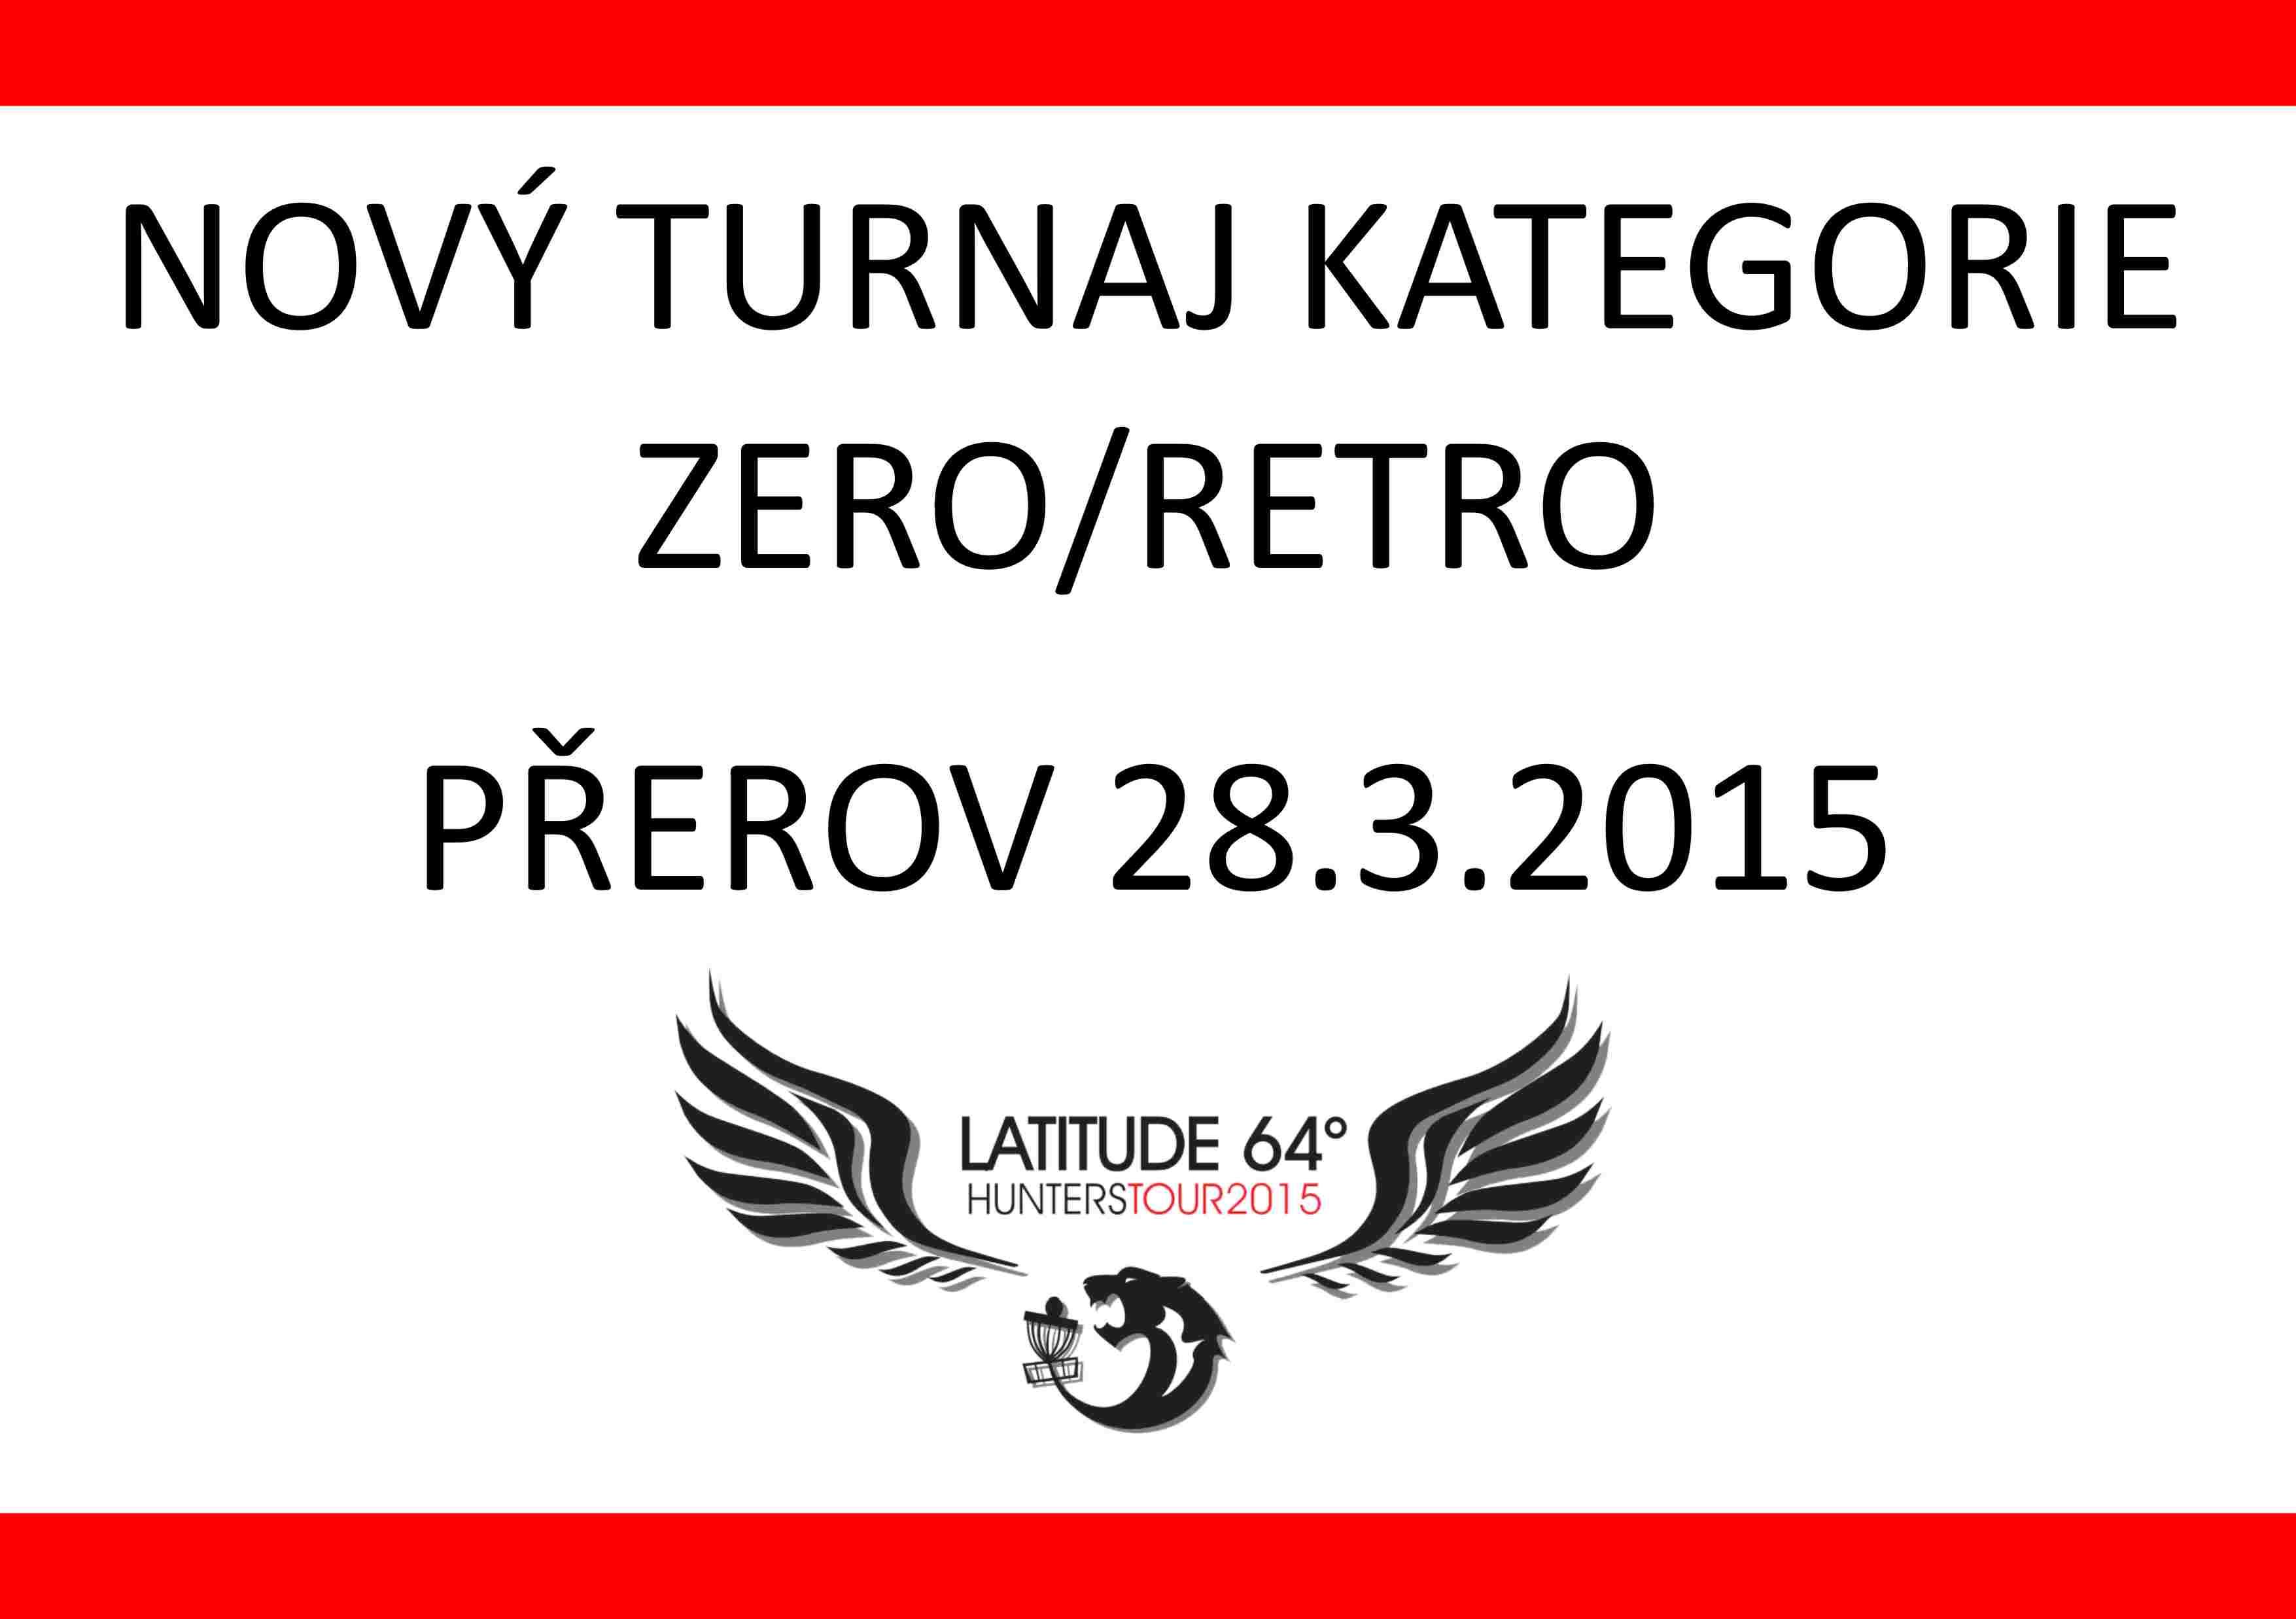 Další turnaj 28.3.2015 v DG Parku Laguna v okolí Přerova